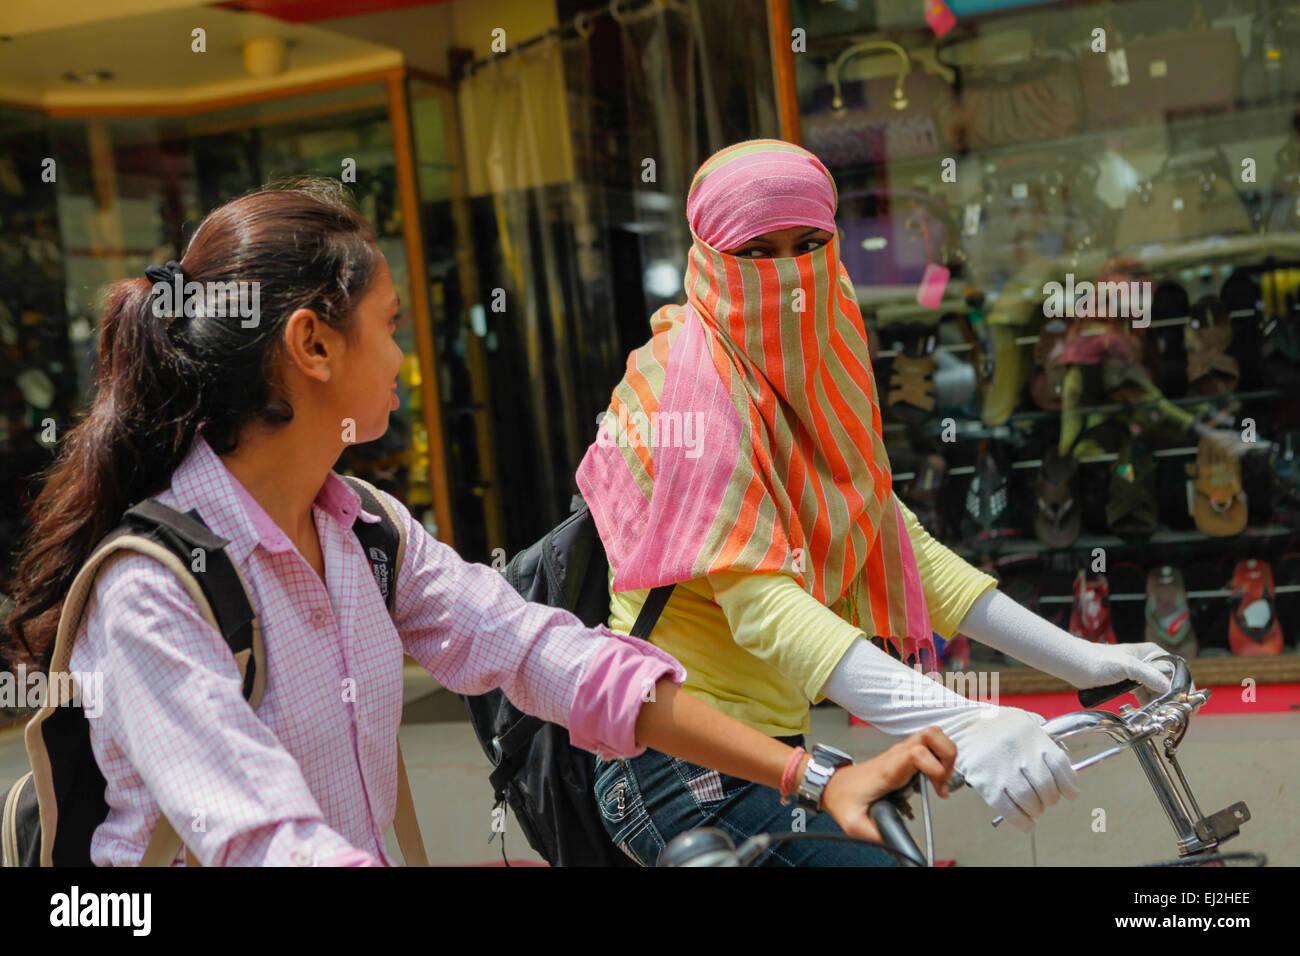 hijab ride